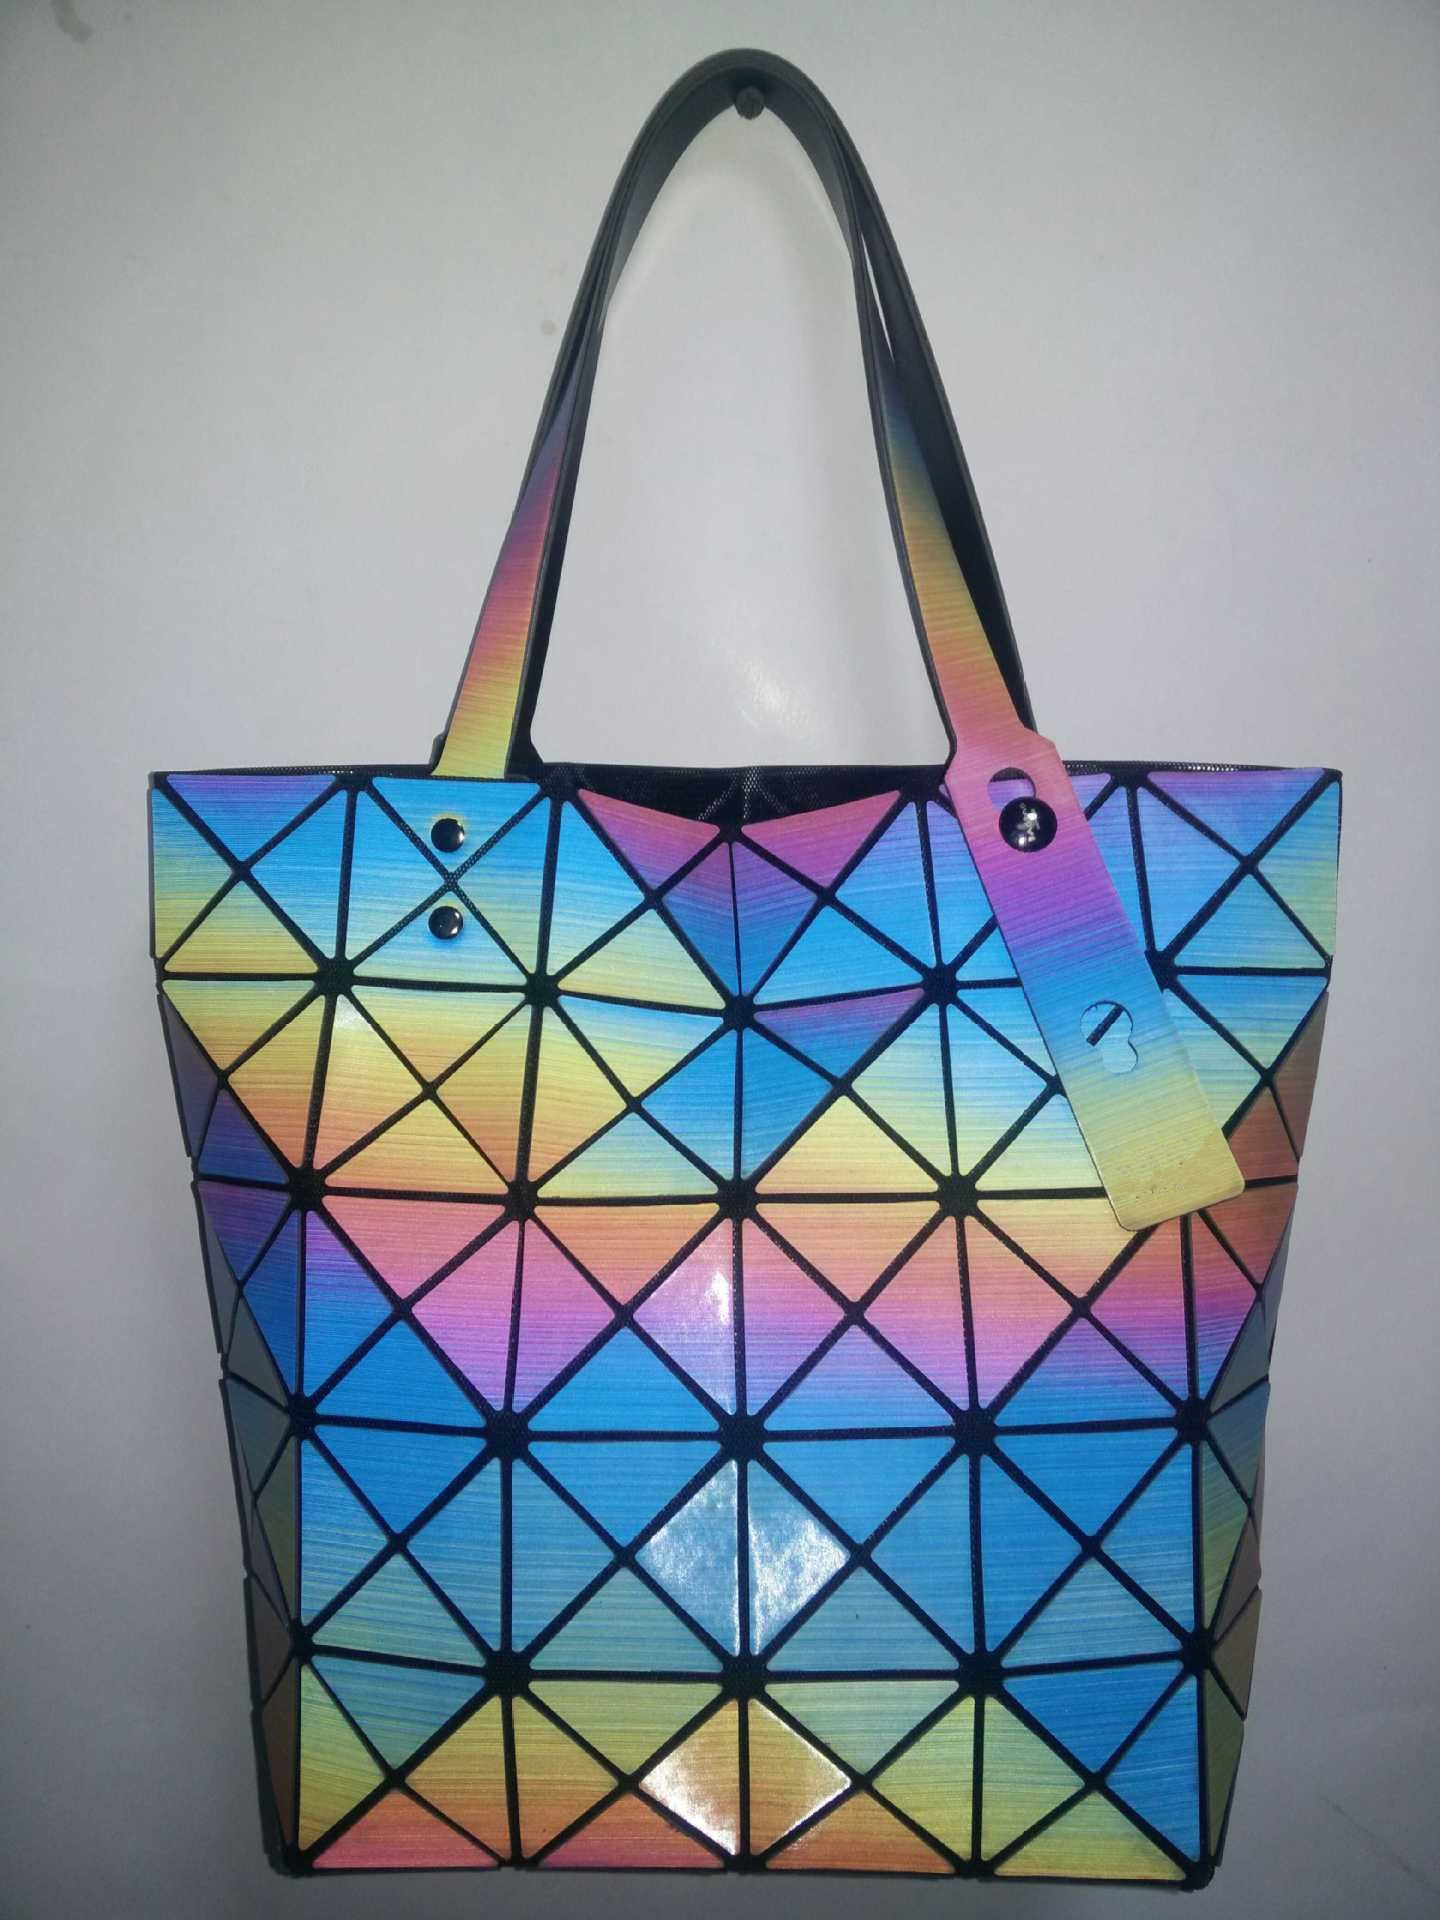 Hot Fashion Brand Women's Same As Baobao BAG Colorful Ladies' Bao Bao Rainbow Lattice Geometric Rainbow Handbag  Tote Bag #Happy4Sales #backpack #bag #handbags #highschool #L09582 #shoulderbags #YLEY